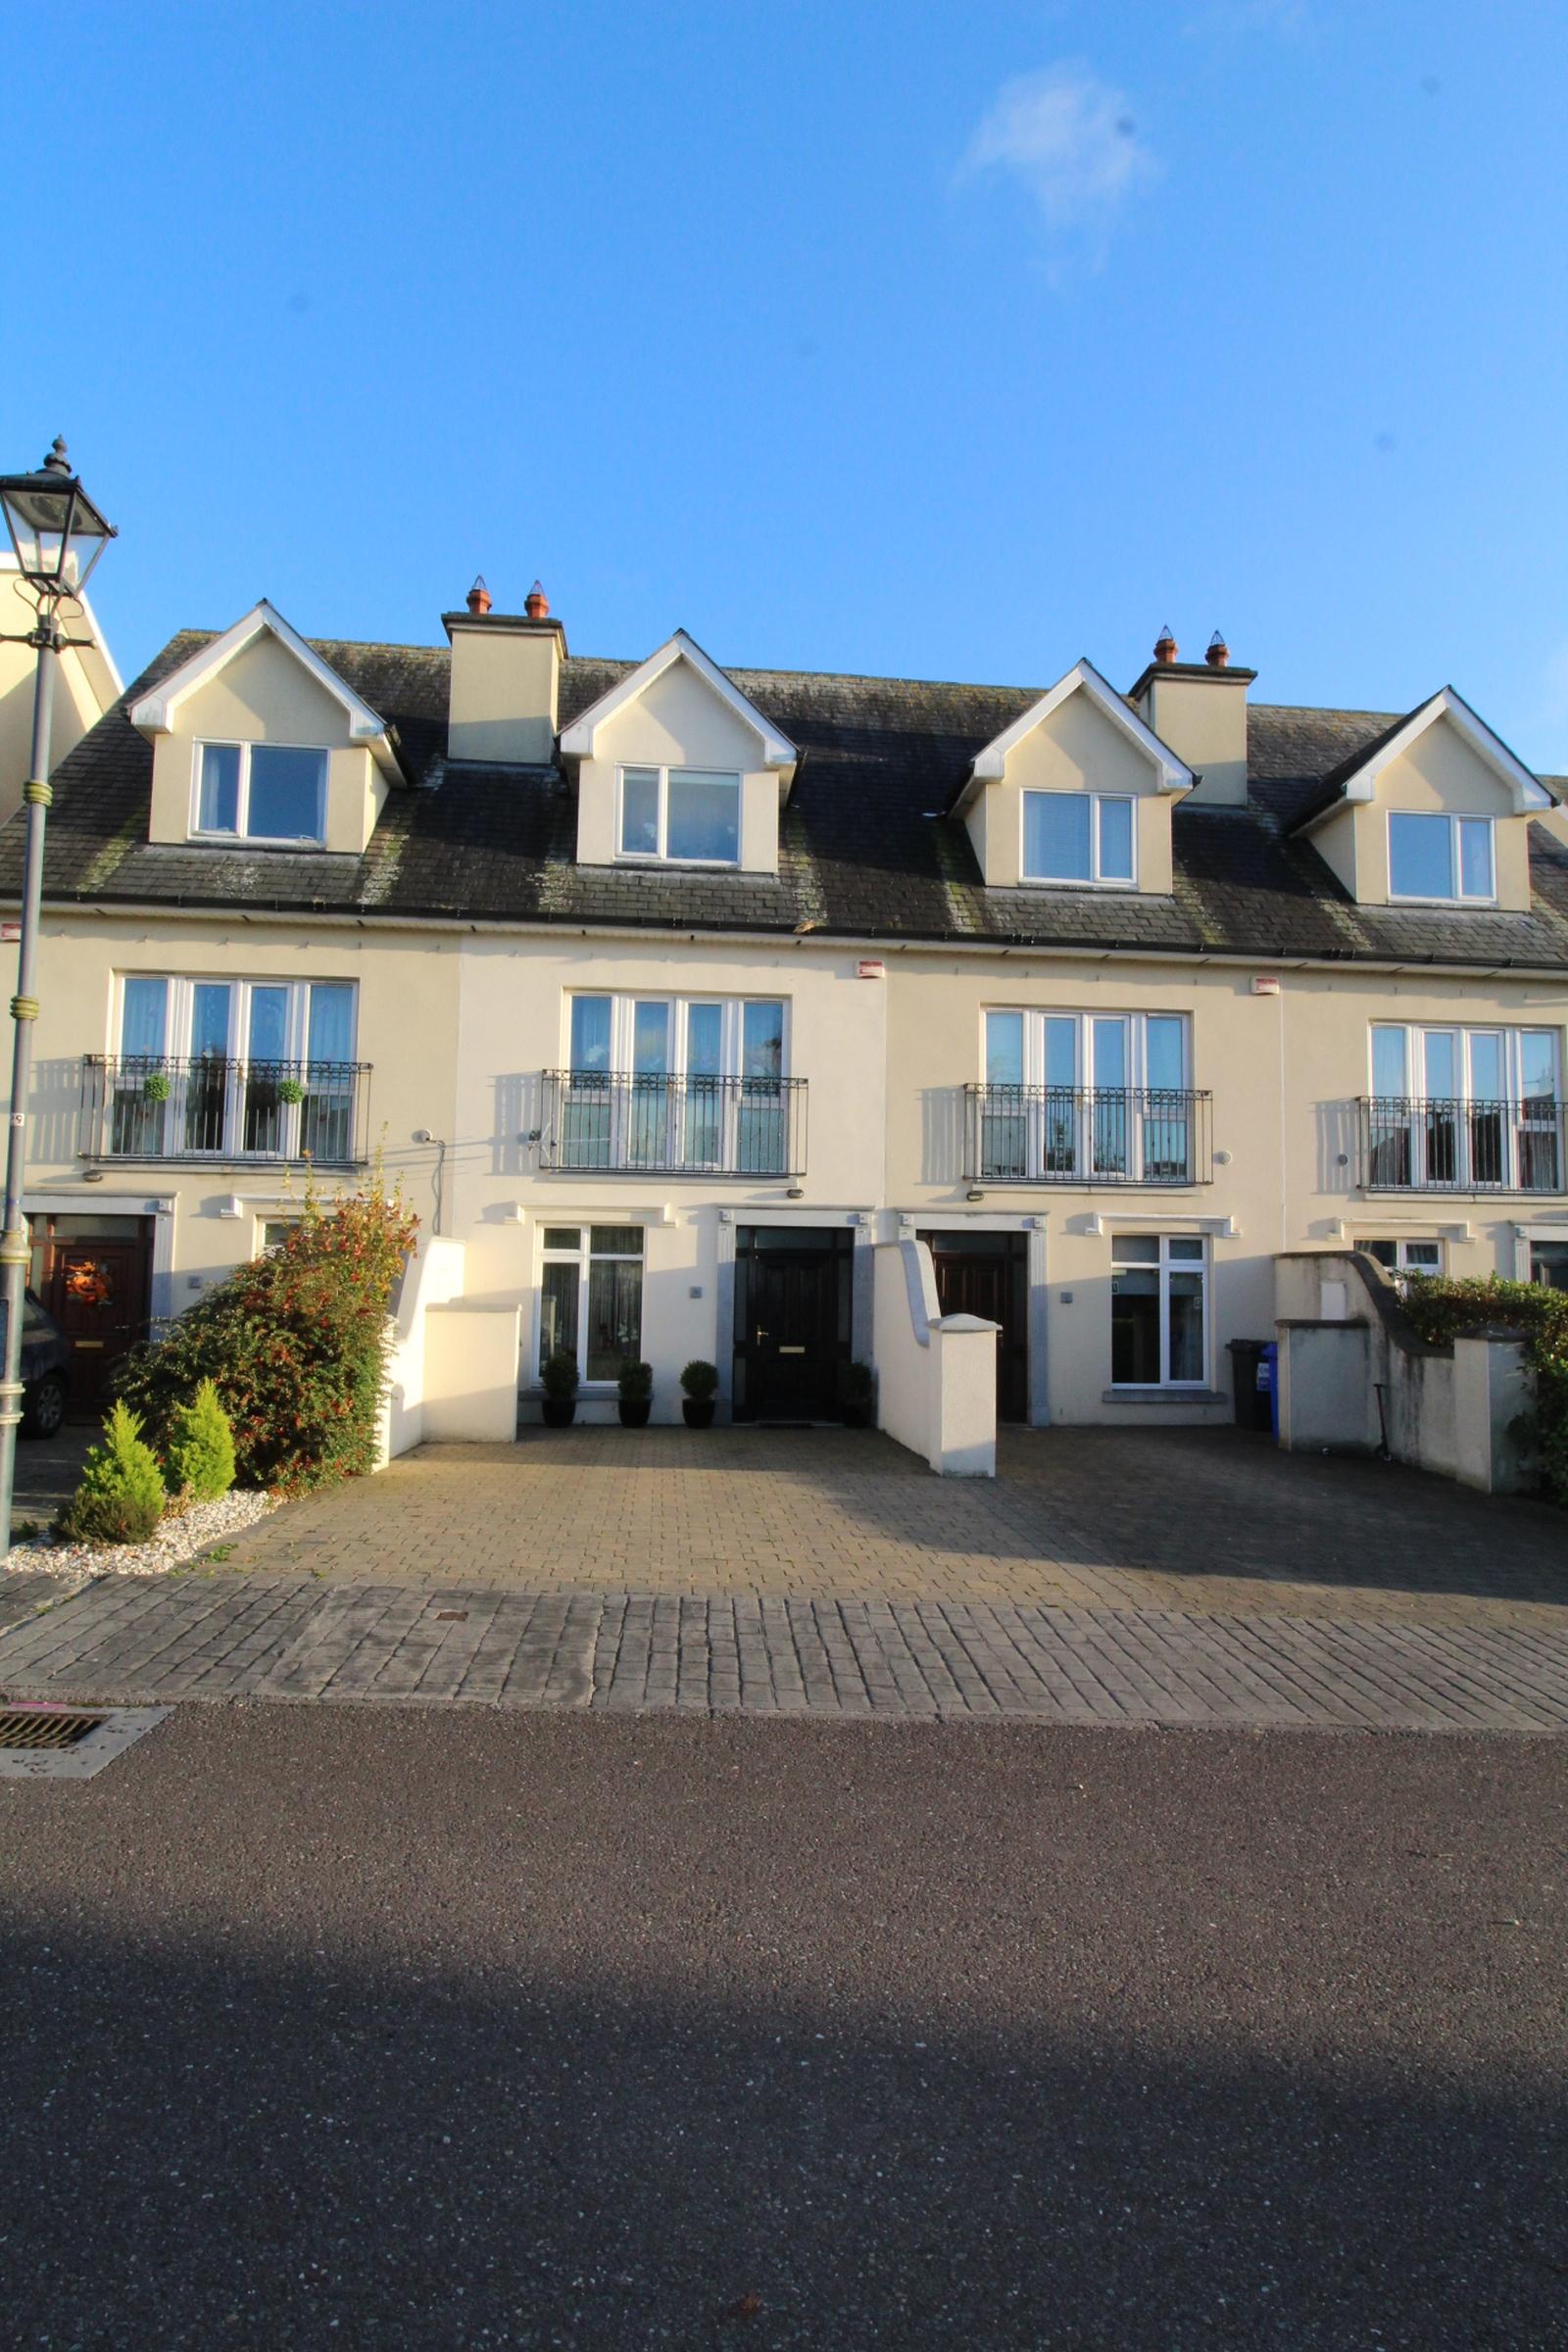 26 Kingsfort Square, Castlepark Village, Mallow, Co. Cork